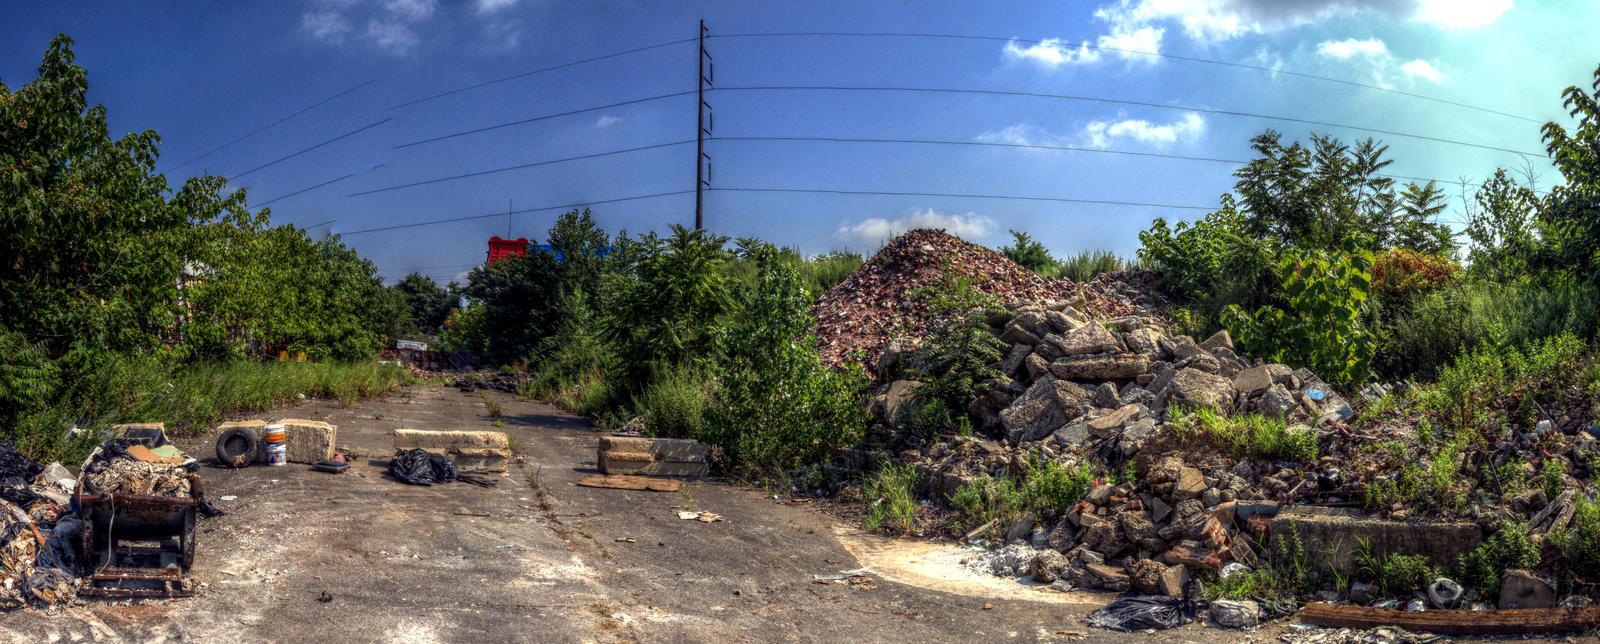 Panorama 3724 hdr pregamma 1 mantiuk06 contrast ma by bruhinb